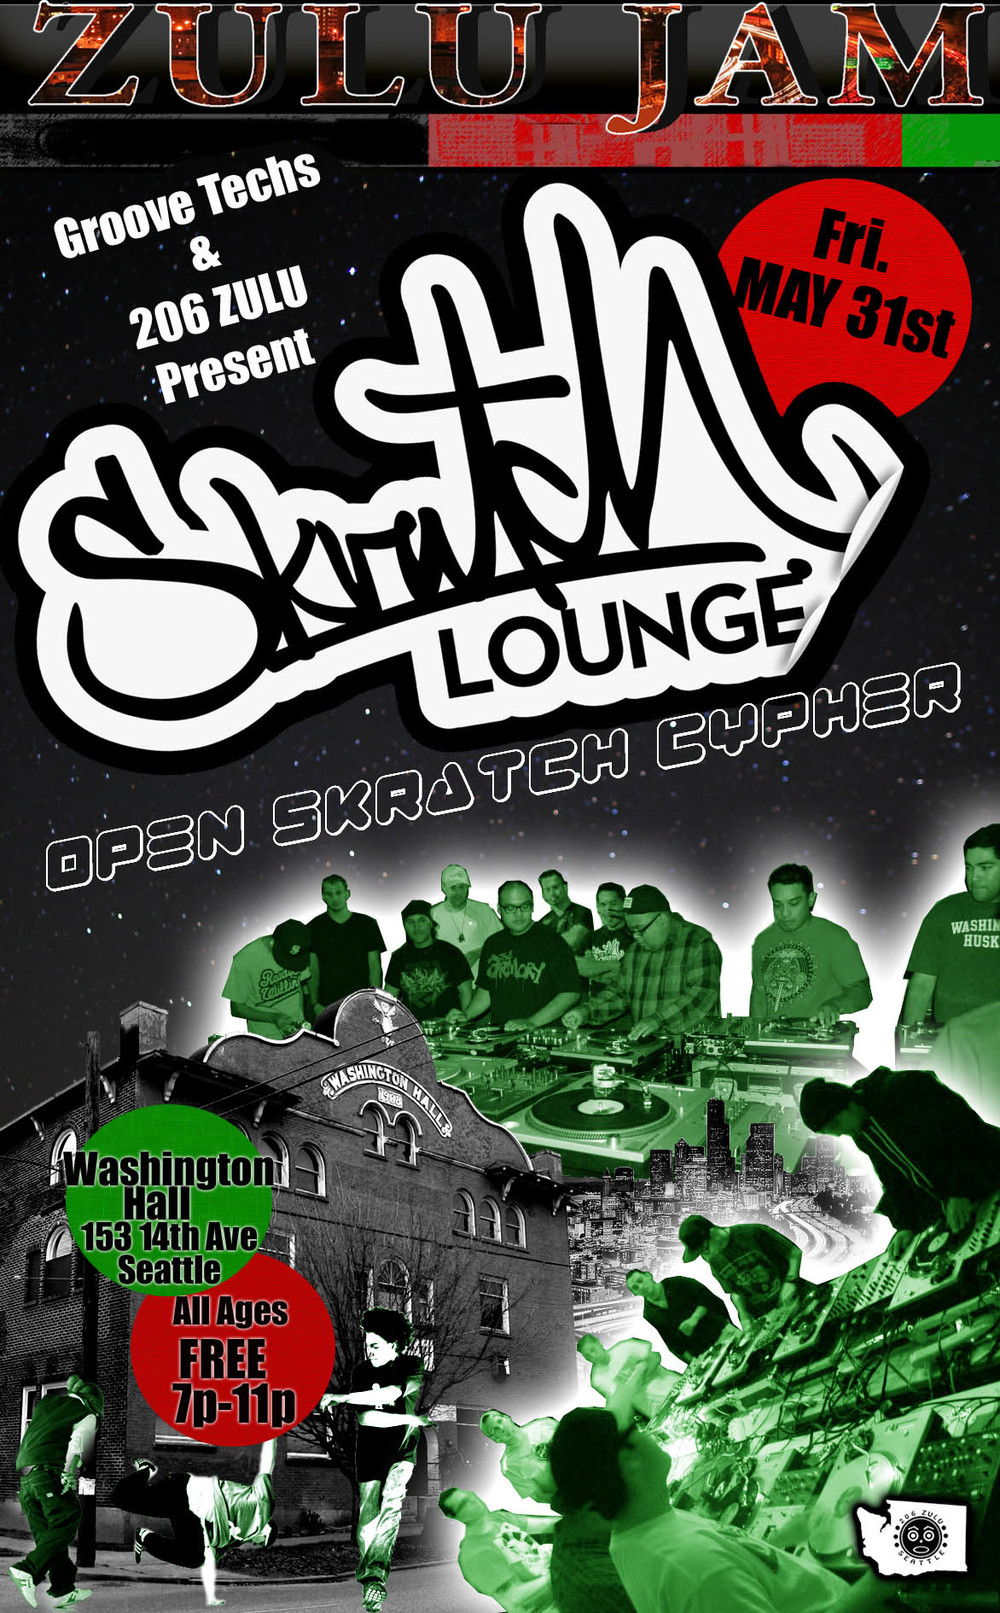 Skratch Lounge Zulu Jam may 2013_small.jpg